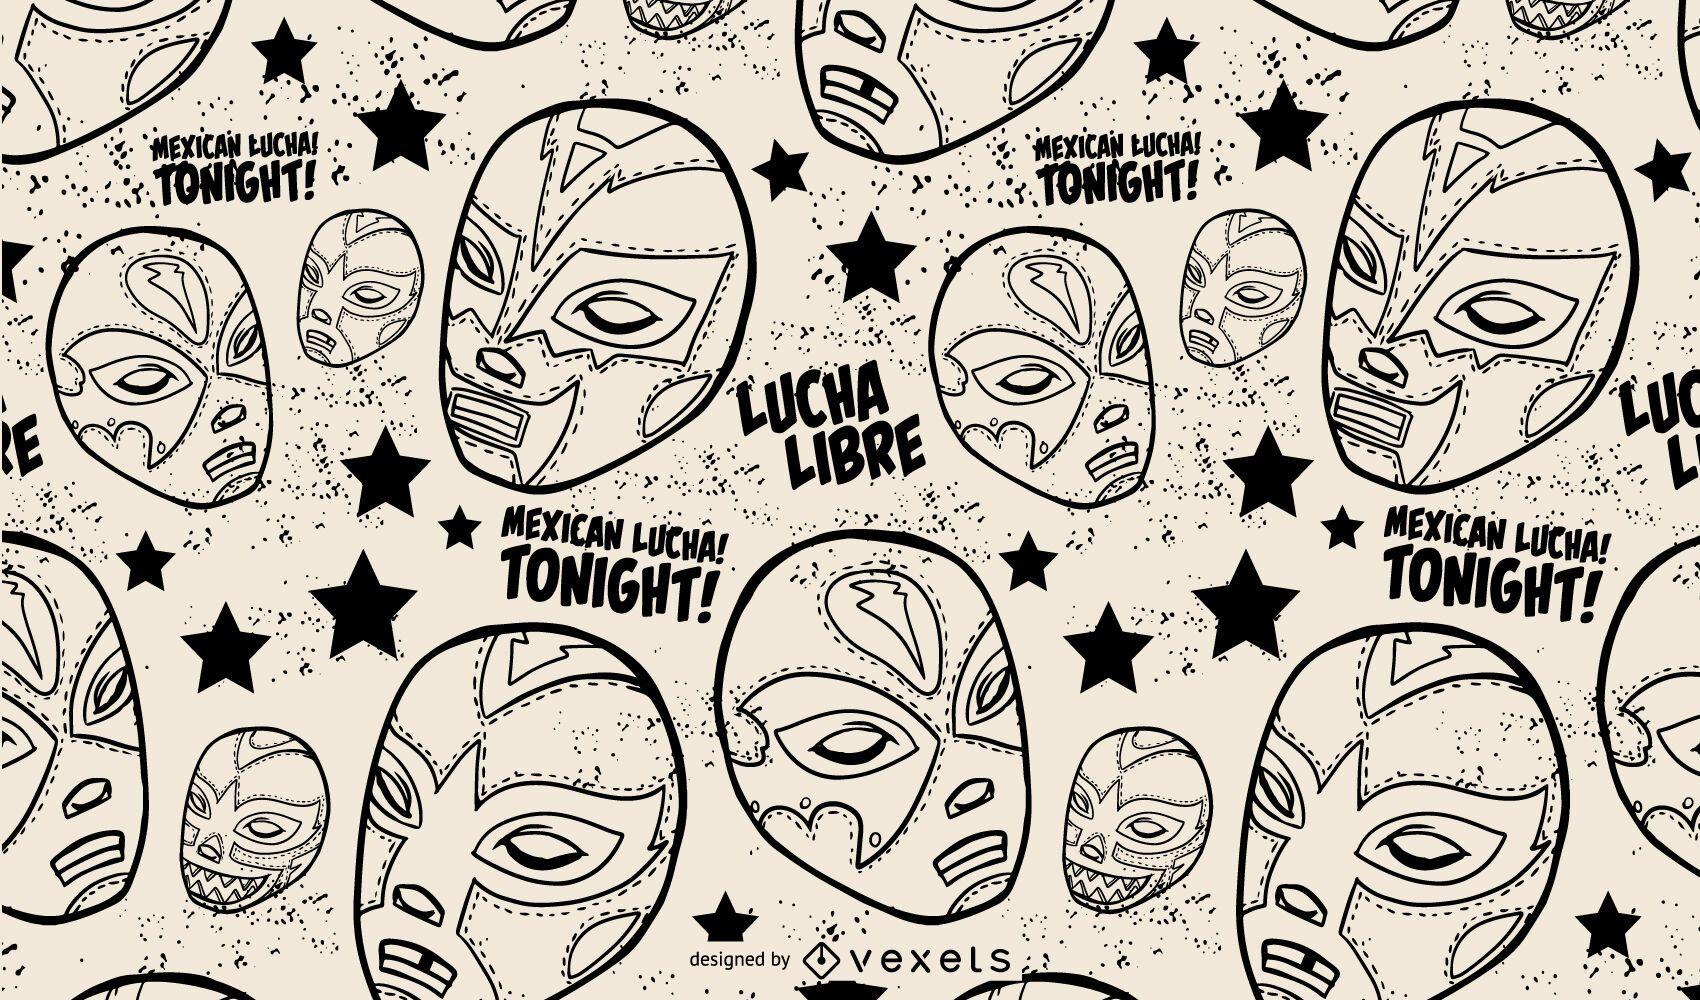 Diseño de patrón de maks de lucha libre mexicana